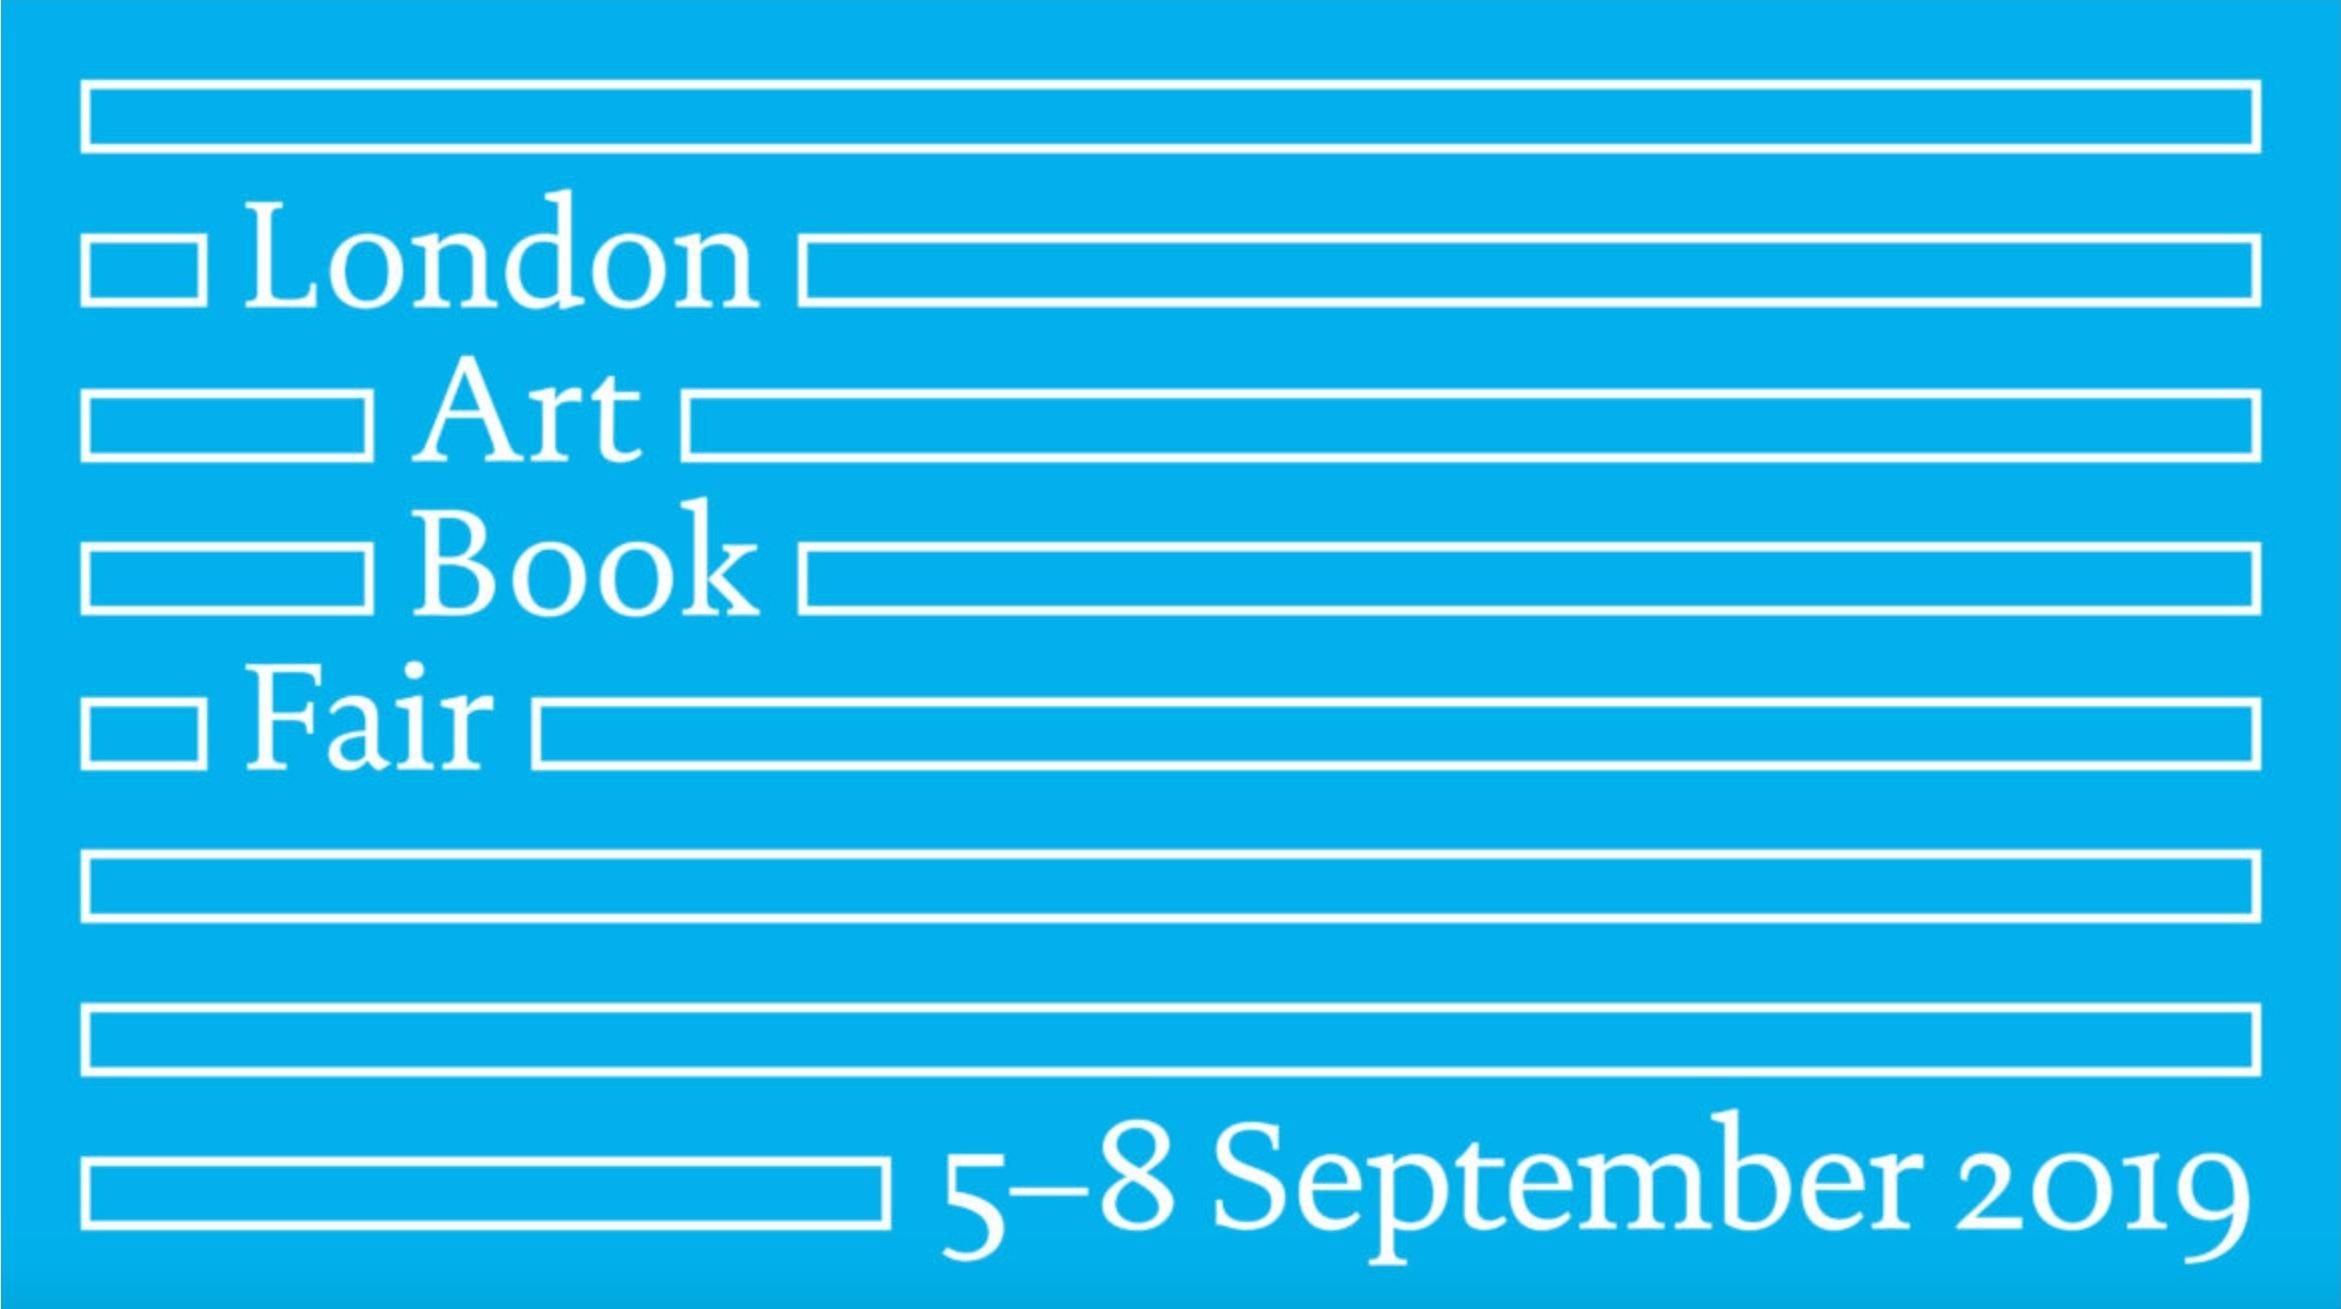 Whitechapel Gallery, 77-82 Whitechapel High St, London, E1 7QX  Thursday 6-9pm | Friday 11am-6pm | Saturday, 11am-6pm | Sunday, 11am-4pm